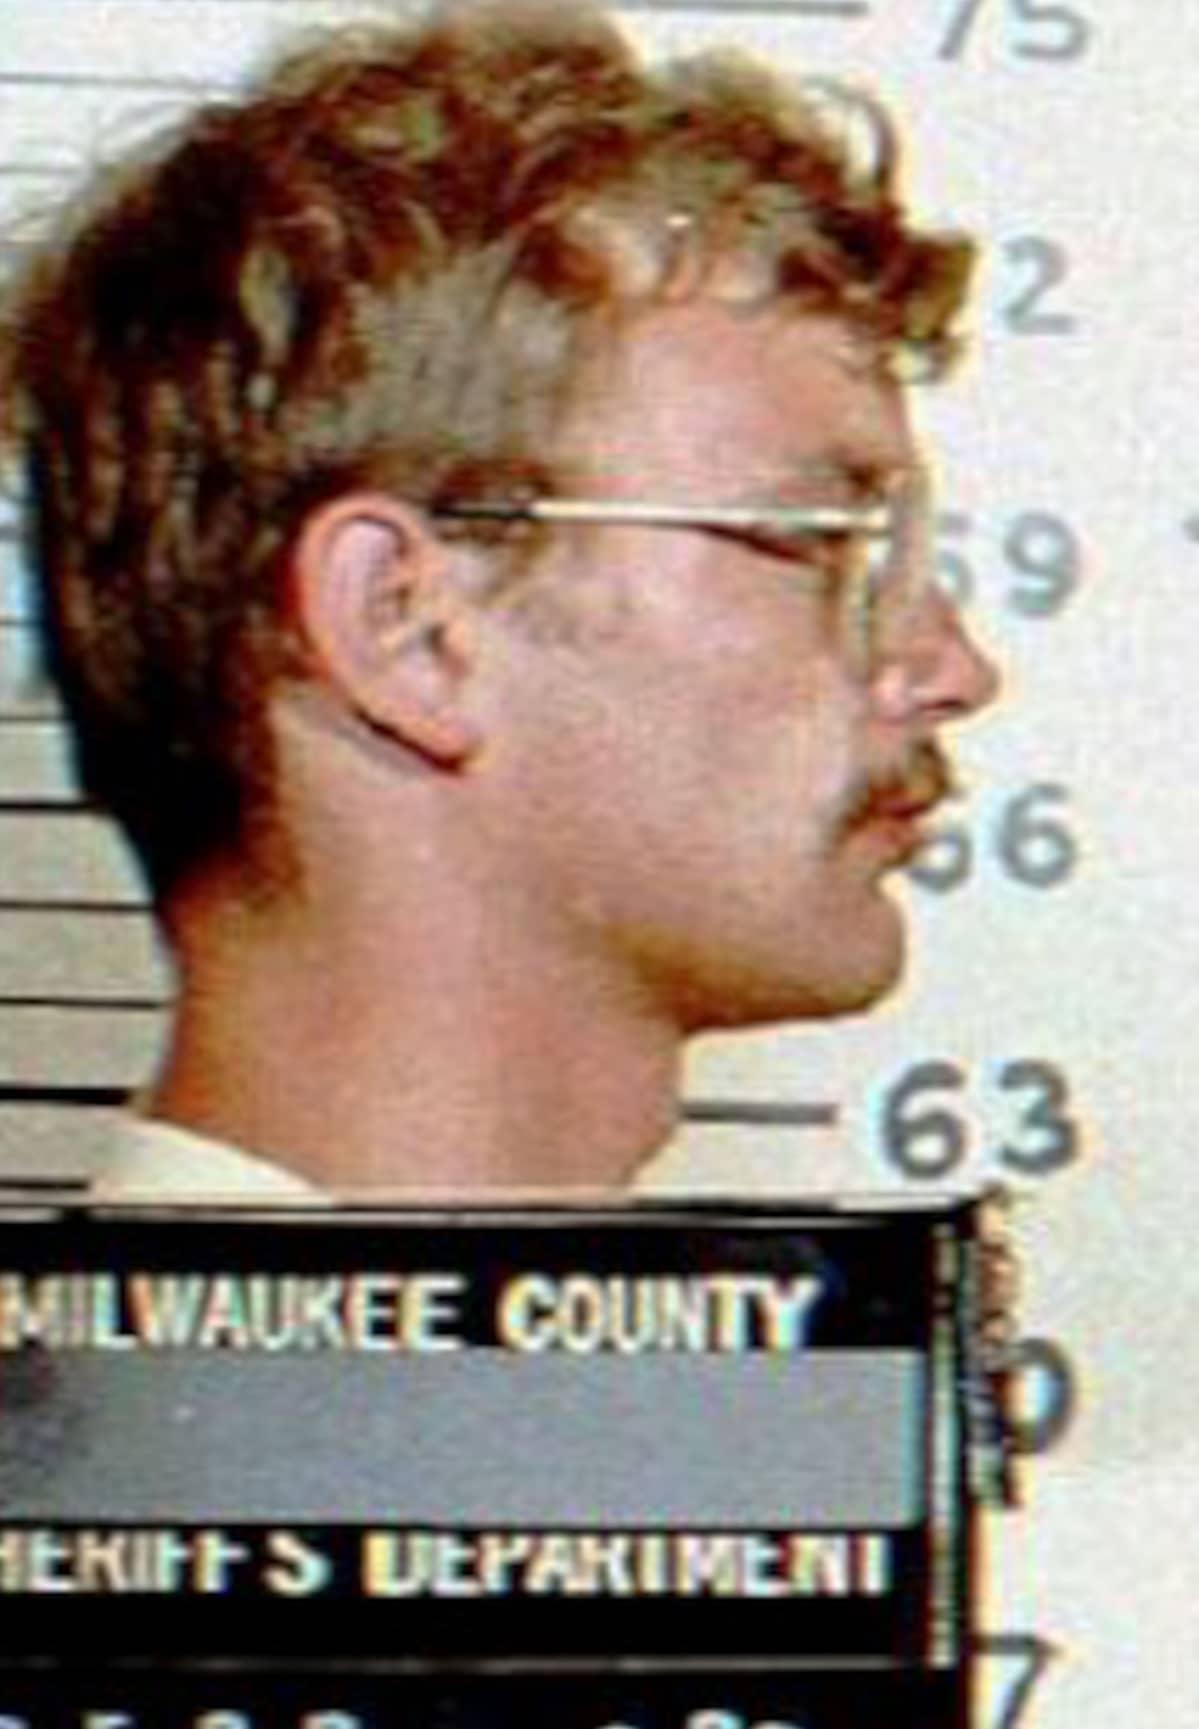 Poliisin kuva Jeffrey Dahmerista.